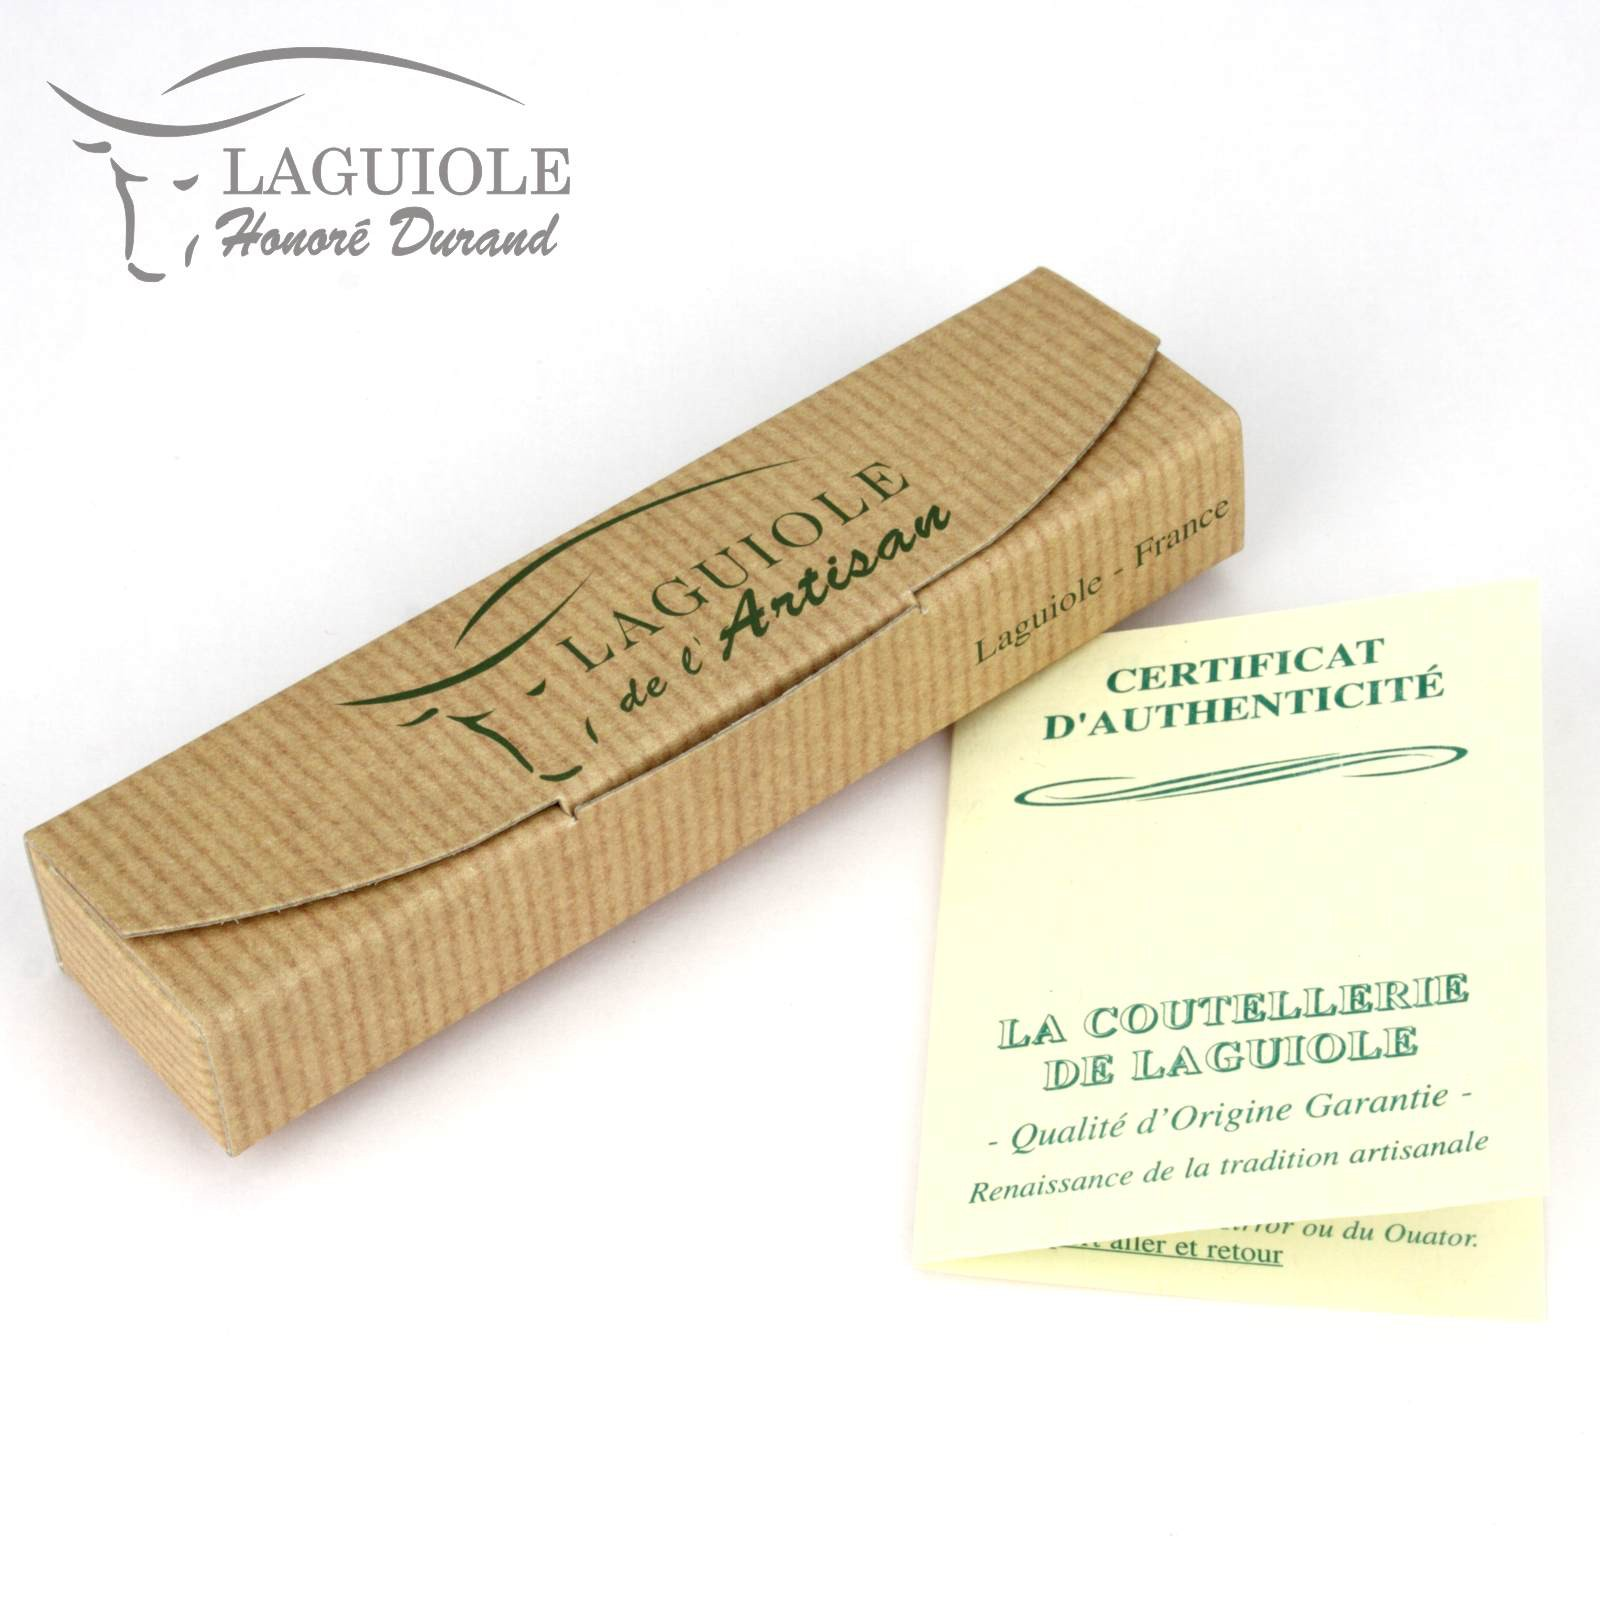 laguiole honor durand serpent holz korkenzieher 12 cm taschenmesser 118716. Black Bedroom Furniture Sets. Home Design Ideas